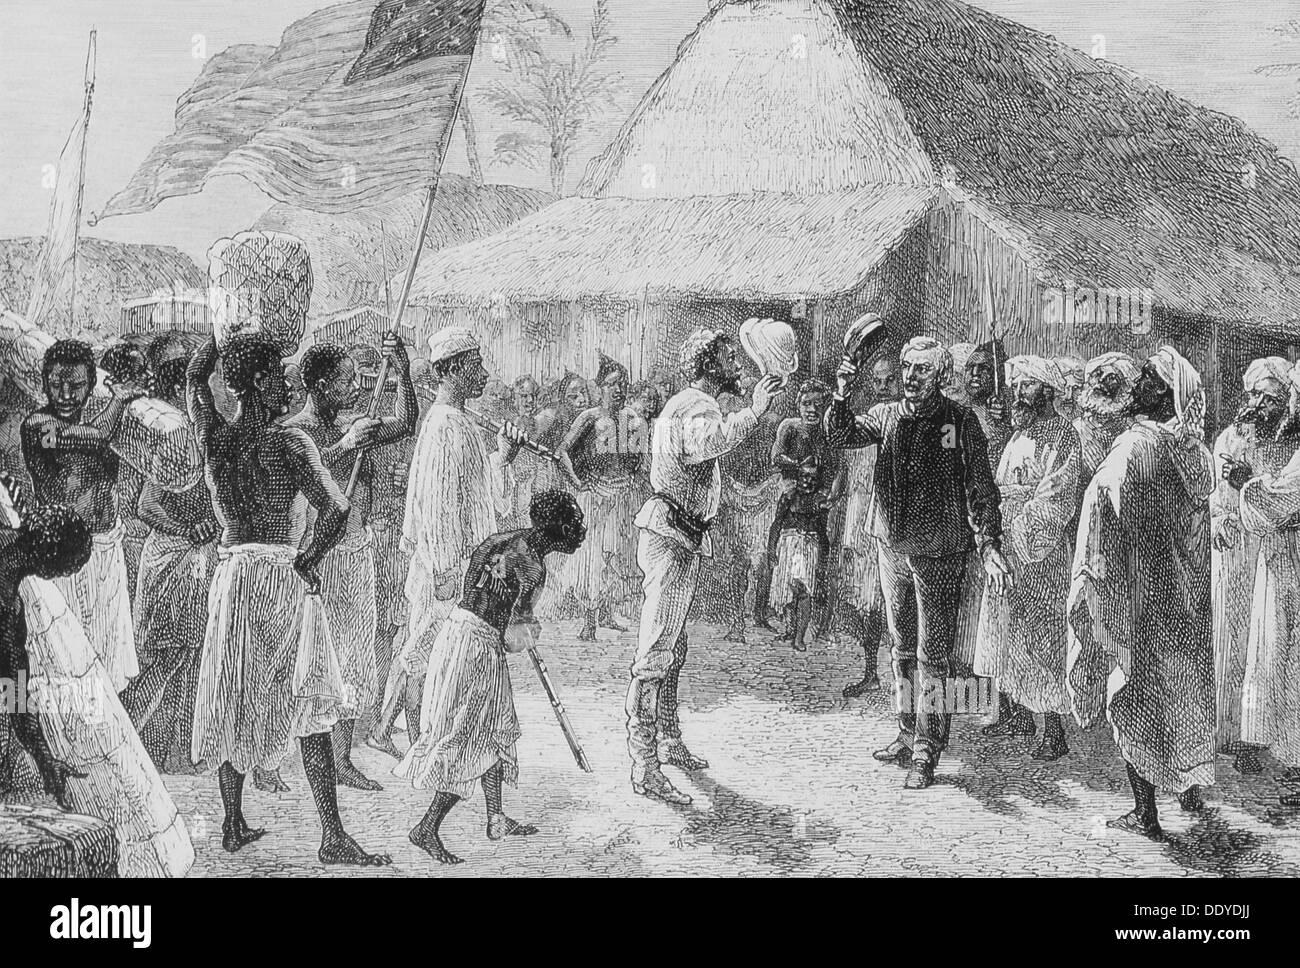 Doctor Livingstone I Presume?, 1871. The Historic Meeting Between Henry  Morton Stanley (